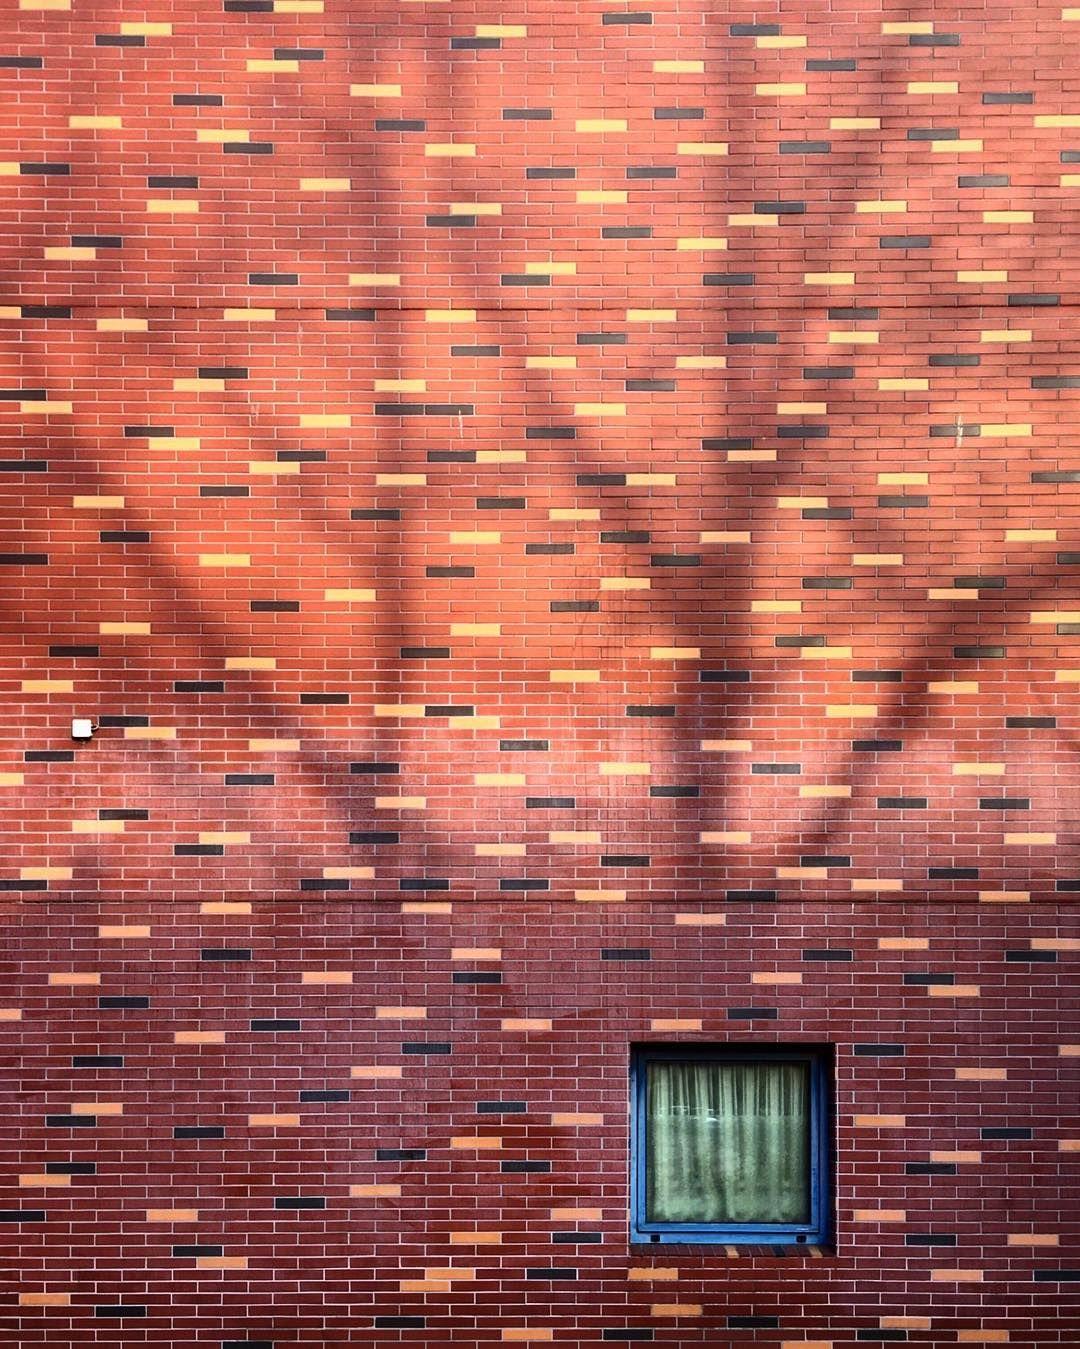 Treehouse ▫️▫️▫️▫️▫️▫️▫️▫️▫️▫️▫️▫️▫️▫️▫️▫️ #ihaveathingforwalls #jj_cheers_walls #jj_doorsandwindows #rsa_doorsandwindows  #harmonyoflight #igersfrankfurt #doorsandwindows_greatshots #living_europe